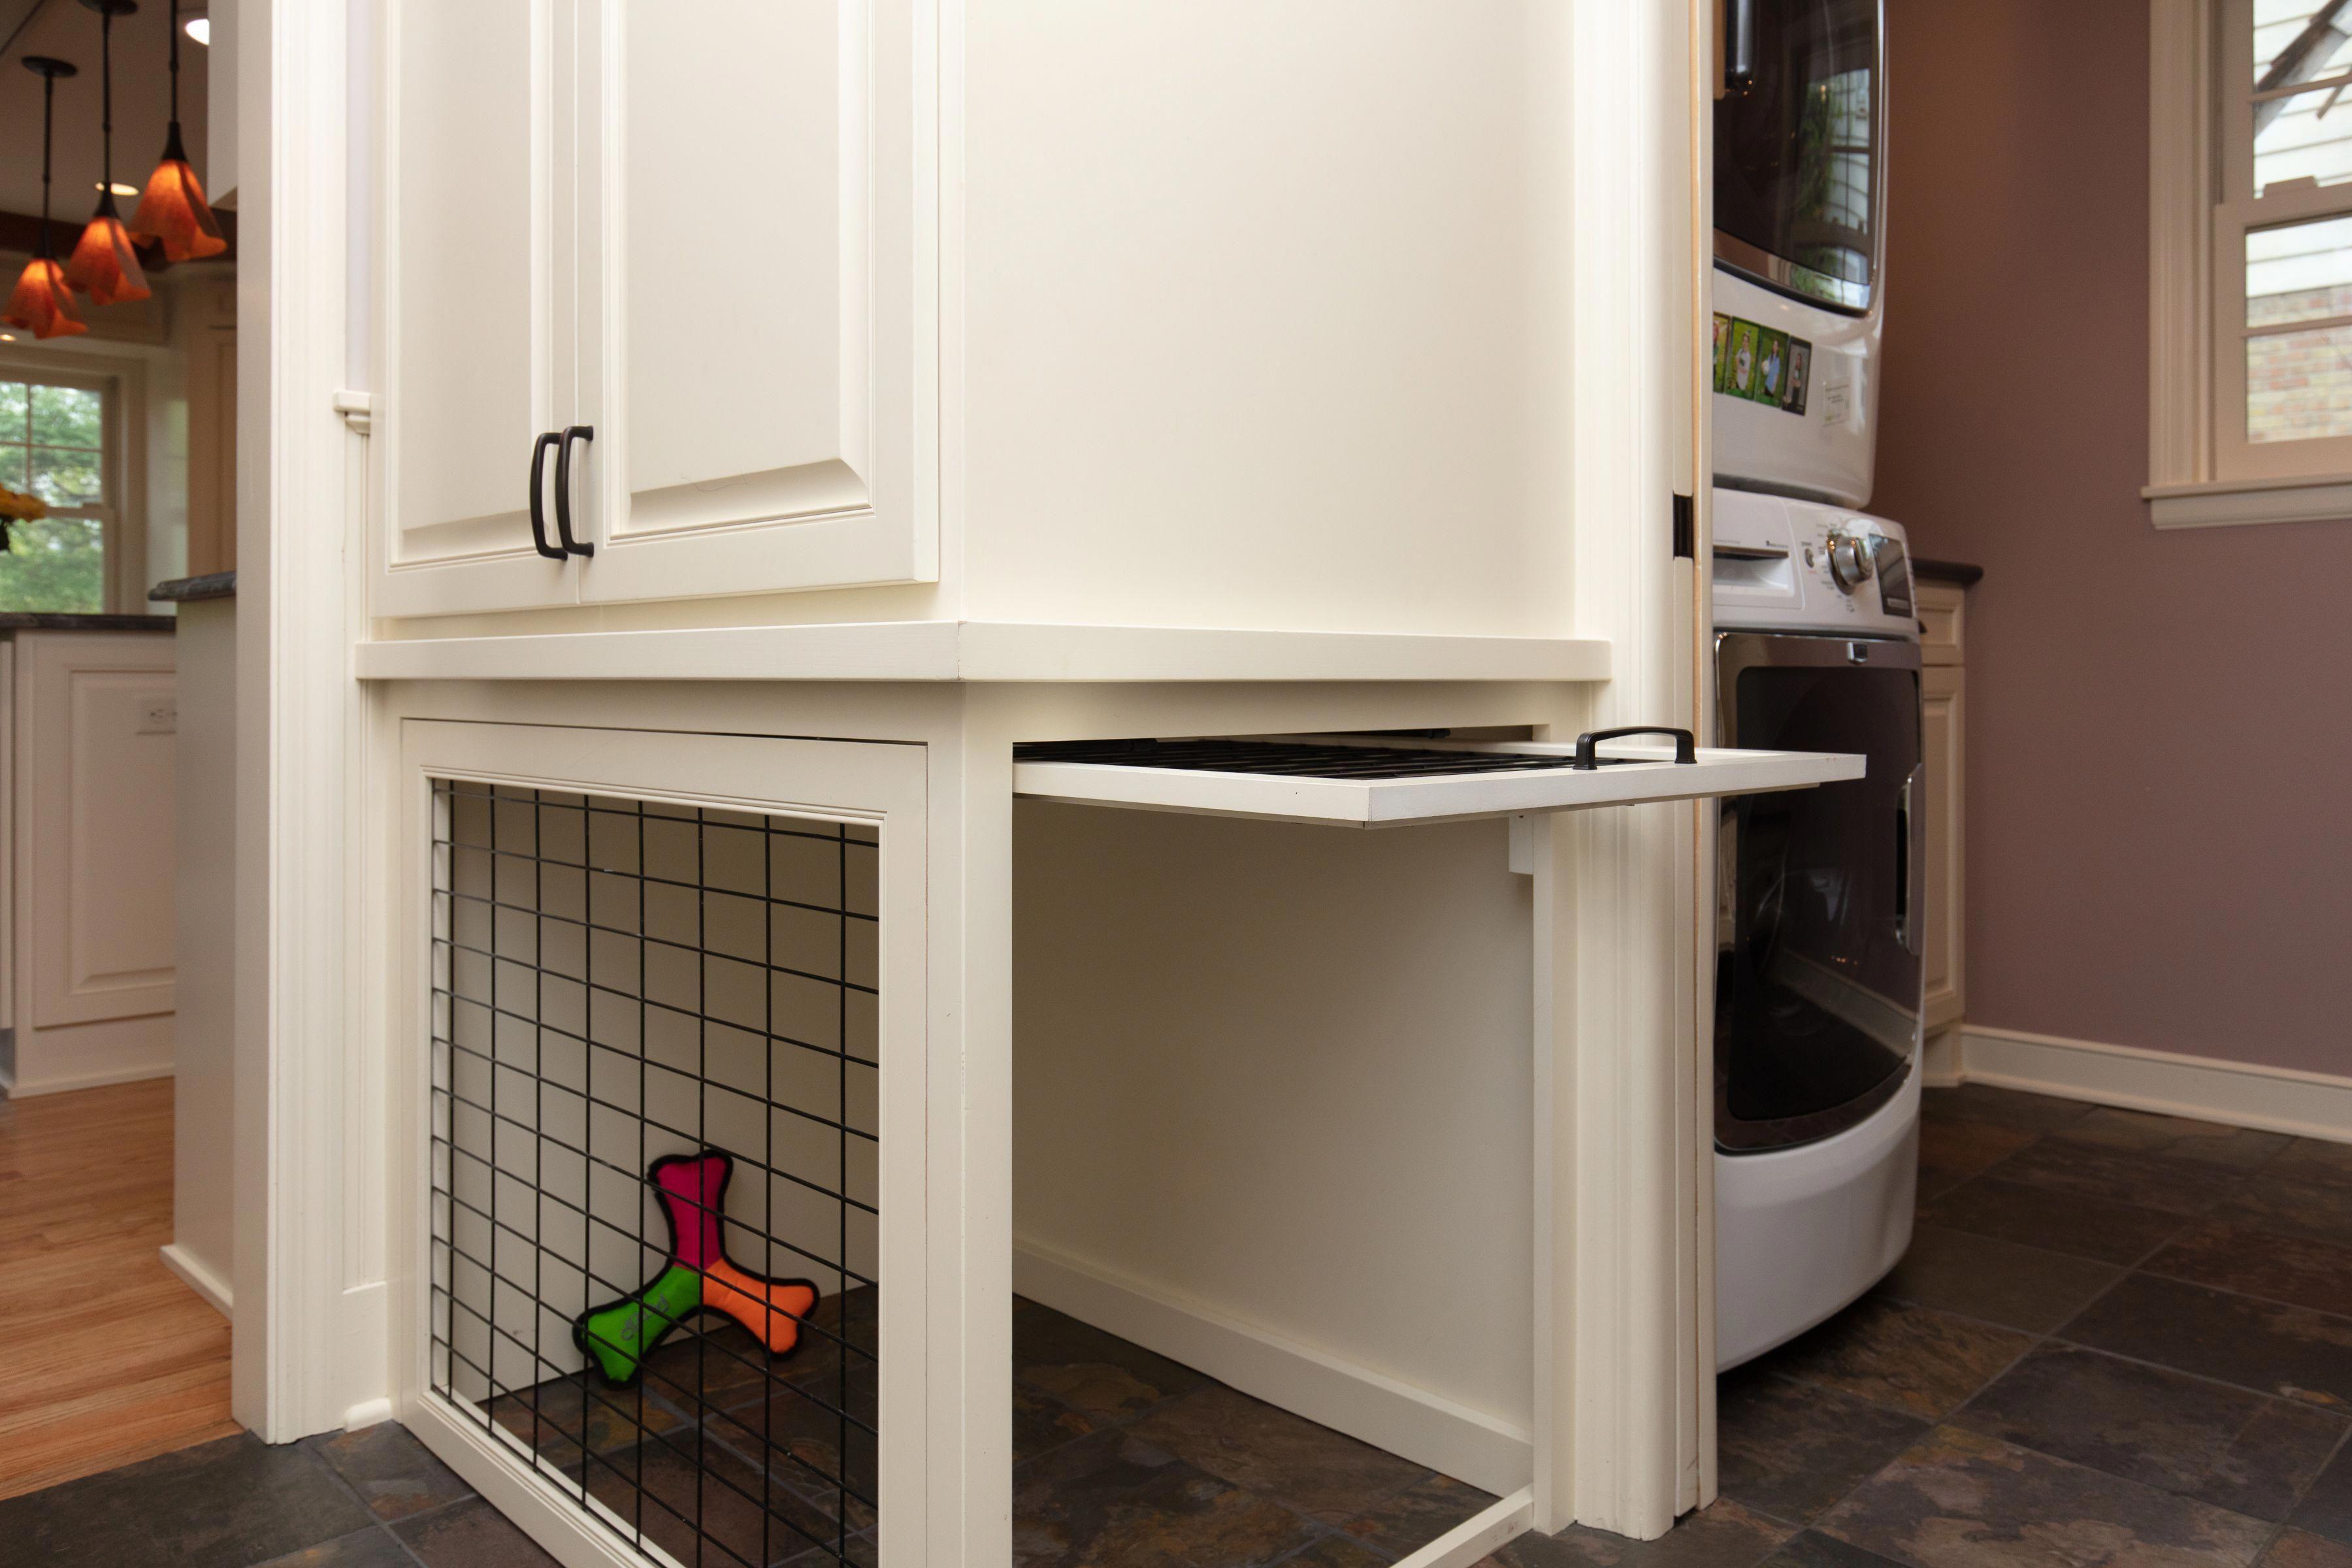 Dog Crate Kitchen Dogcratekitchen Dog Rooms Dog Spaces Closet